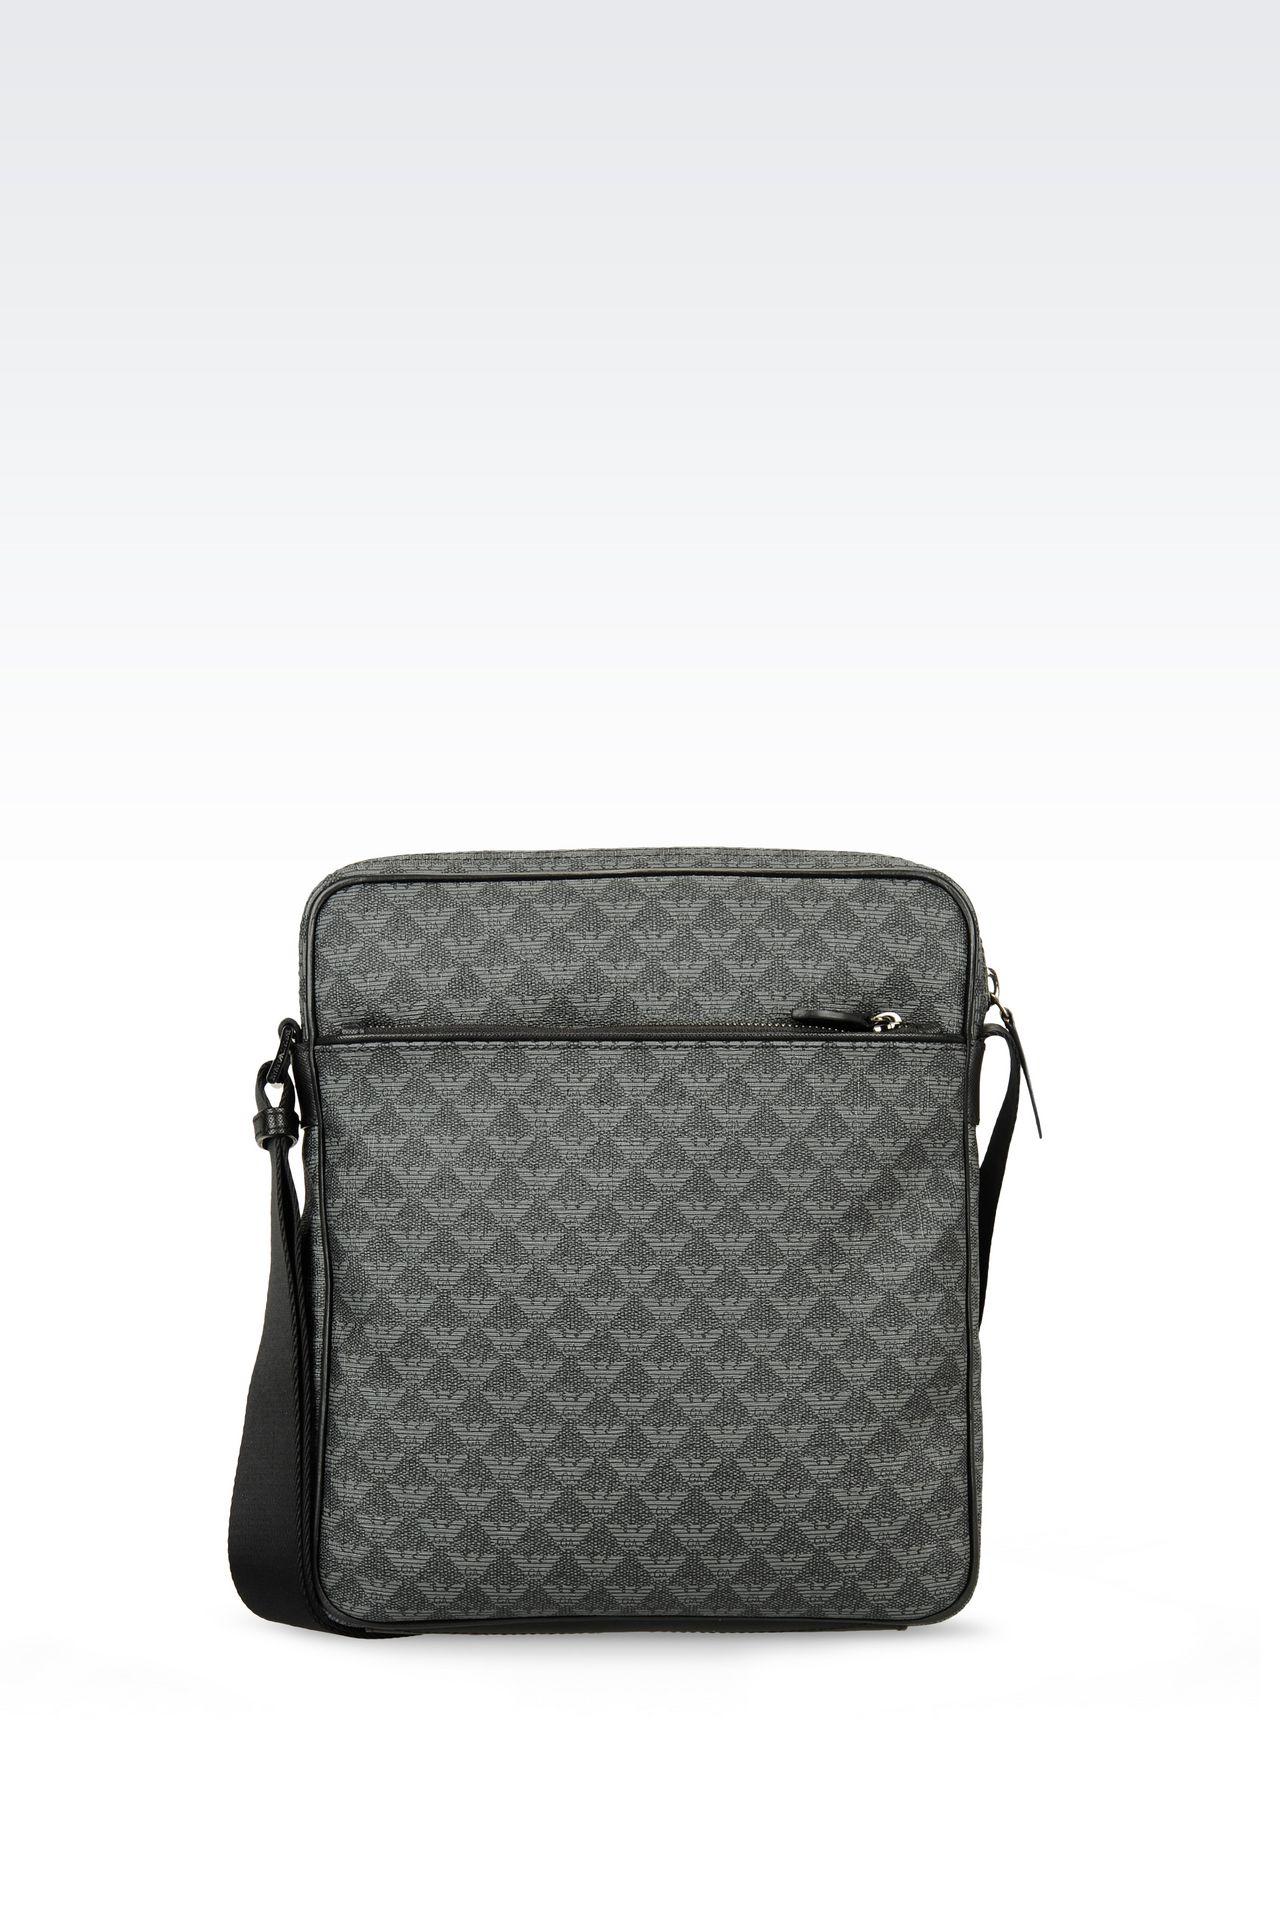 Emporio Armani Messenger Bags for Men - Armani.com